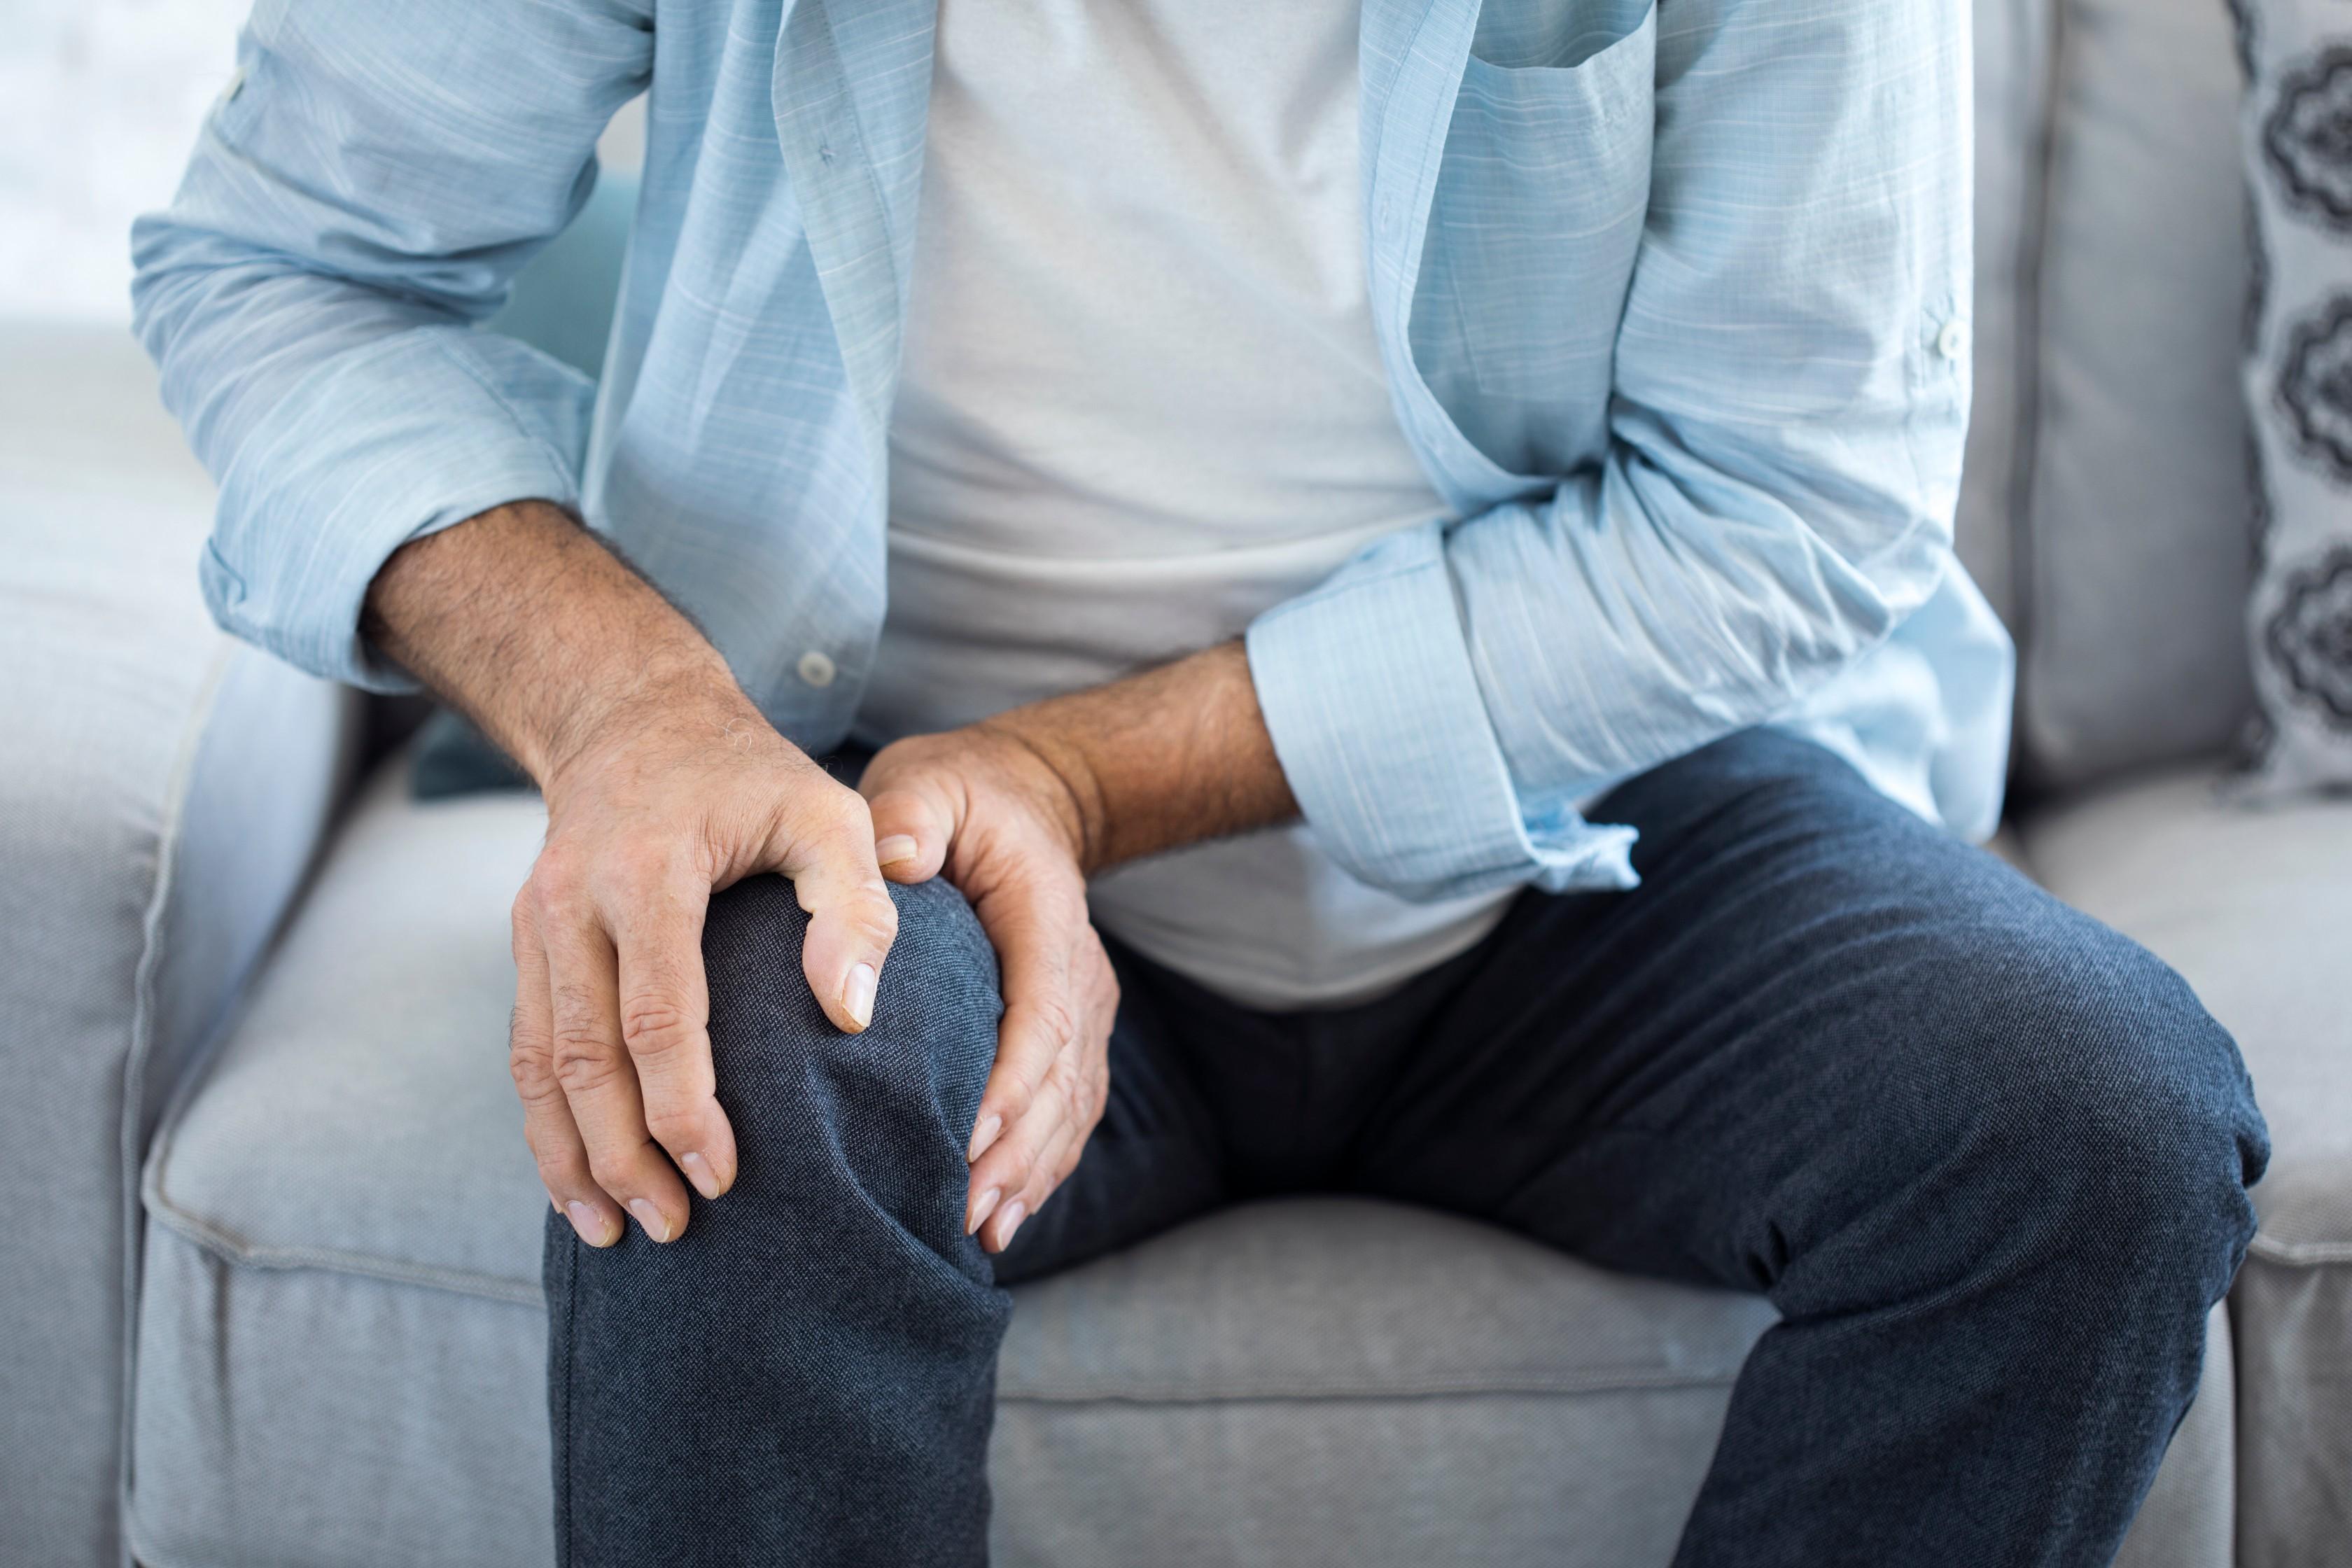 lábfájdalom lelki okai közös krémek áttekintése